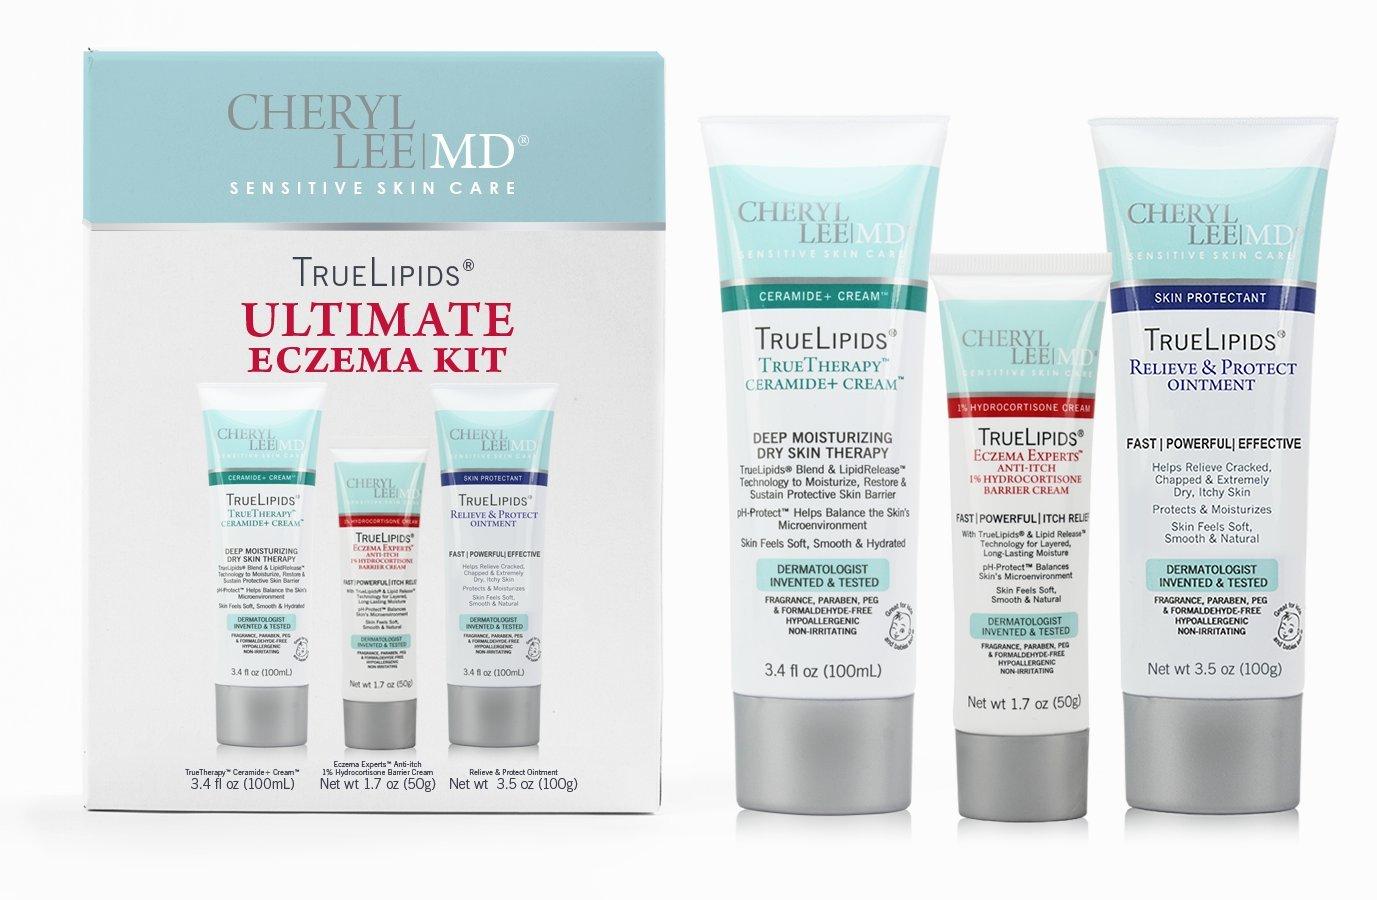 TrueLipids Eczema Treatment Cream for Dry Skin, Itch Relief and Moisturizer